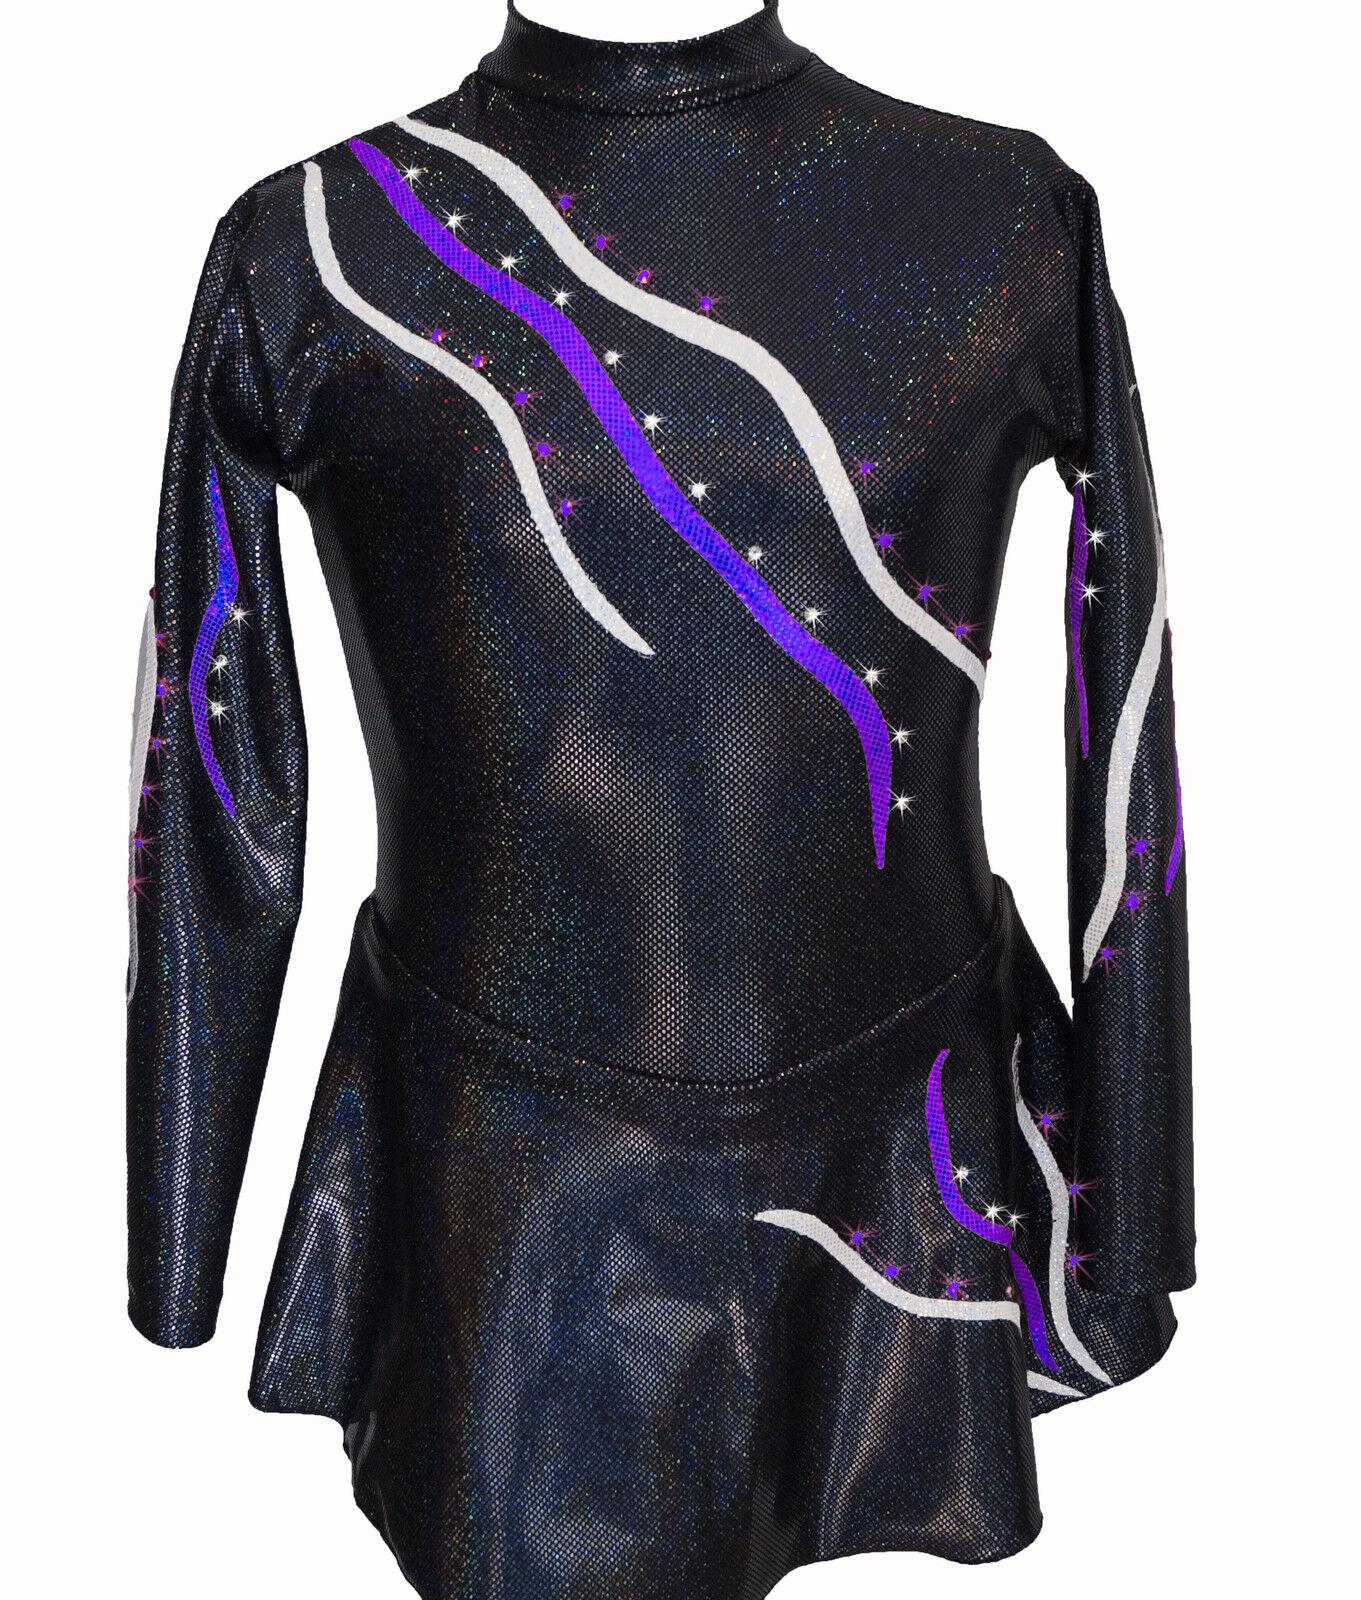 Kürkleid, E165,Hologramm, Strass, Eiskunstlauf, Rollkunstlauf, RSG RSG RSG 855792